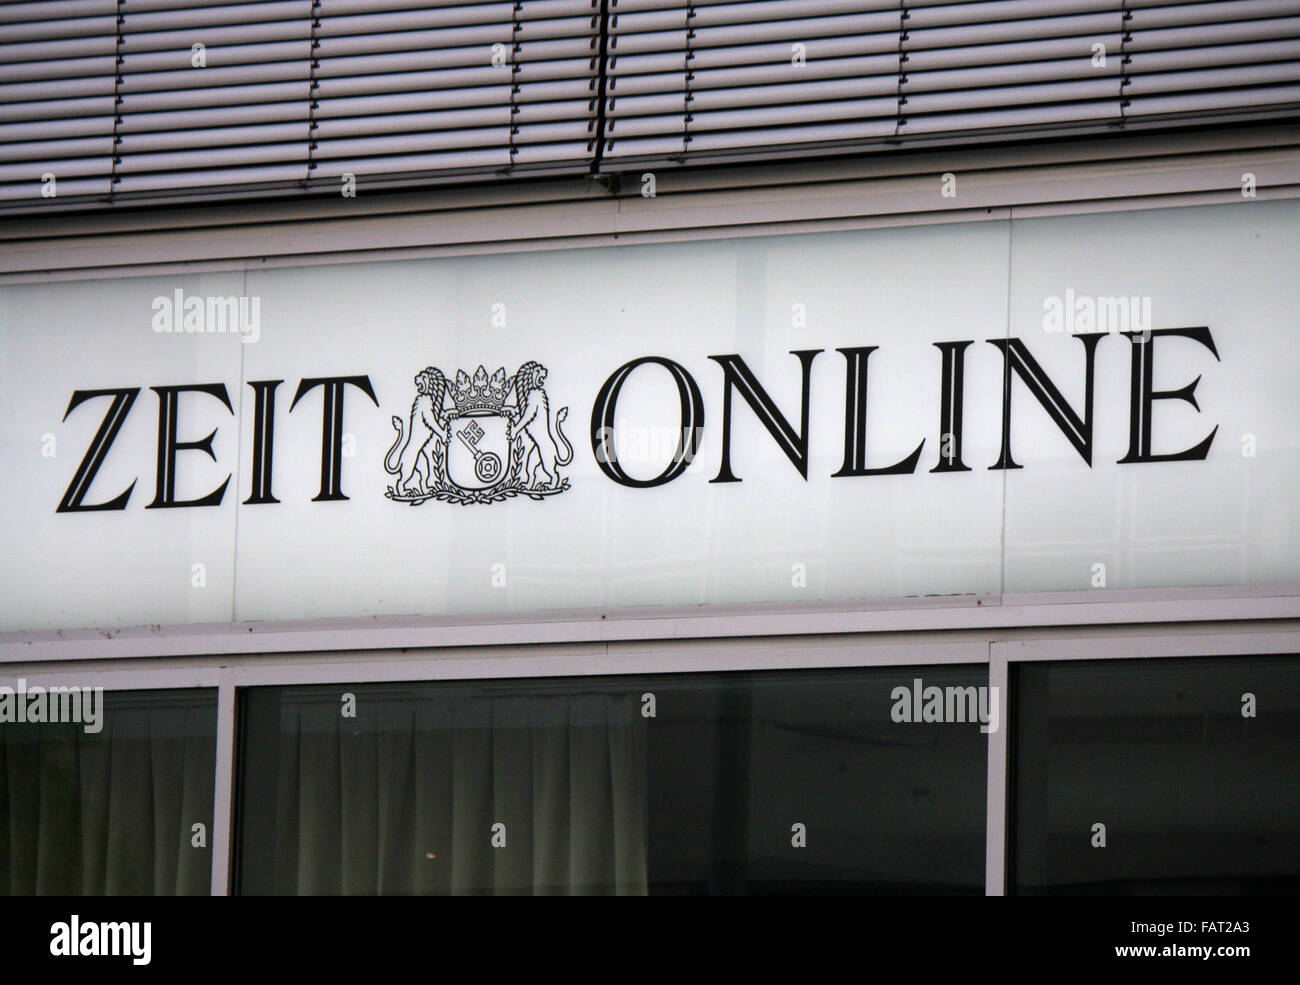 Markenname: 'Zeit online', Berlin. - Stock Image